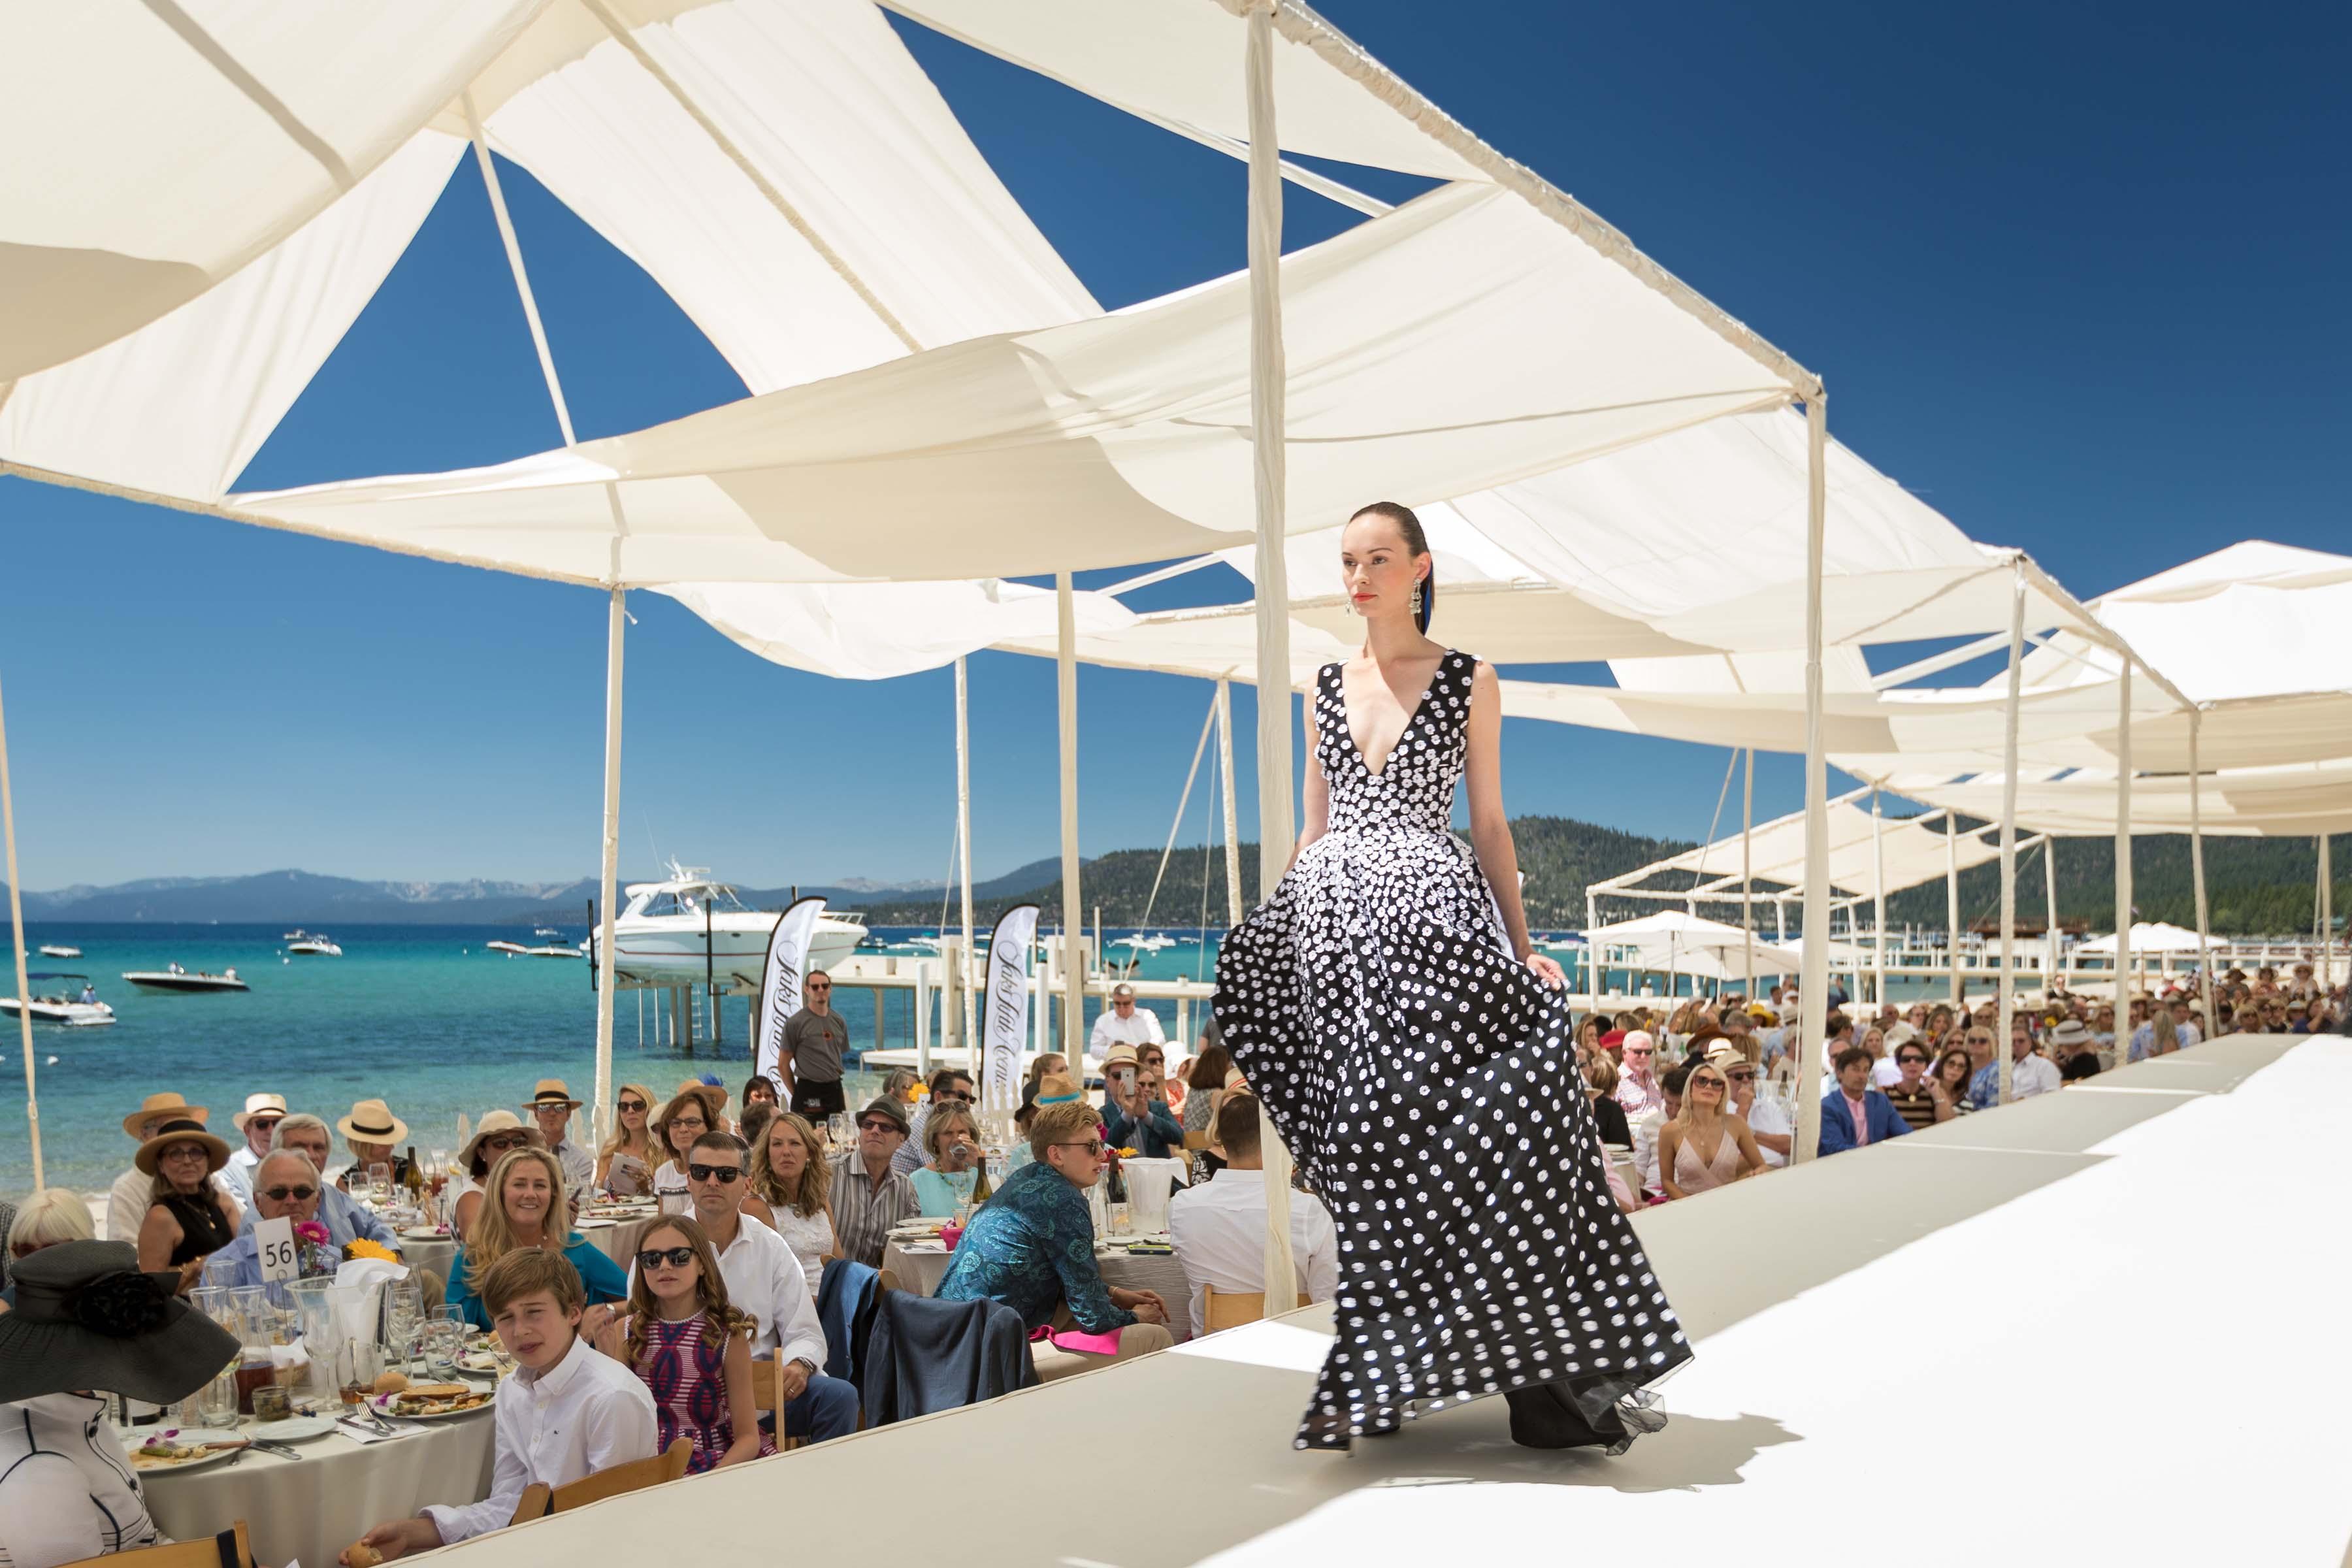 Oscar de la Renta Saks Fifth Avenue Lake Tahoe benefit fashion show 2016